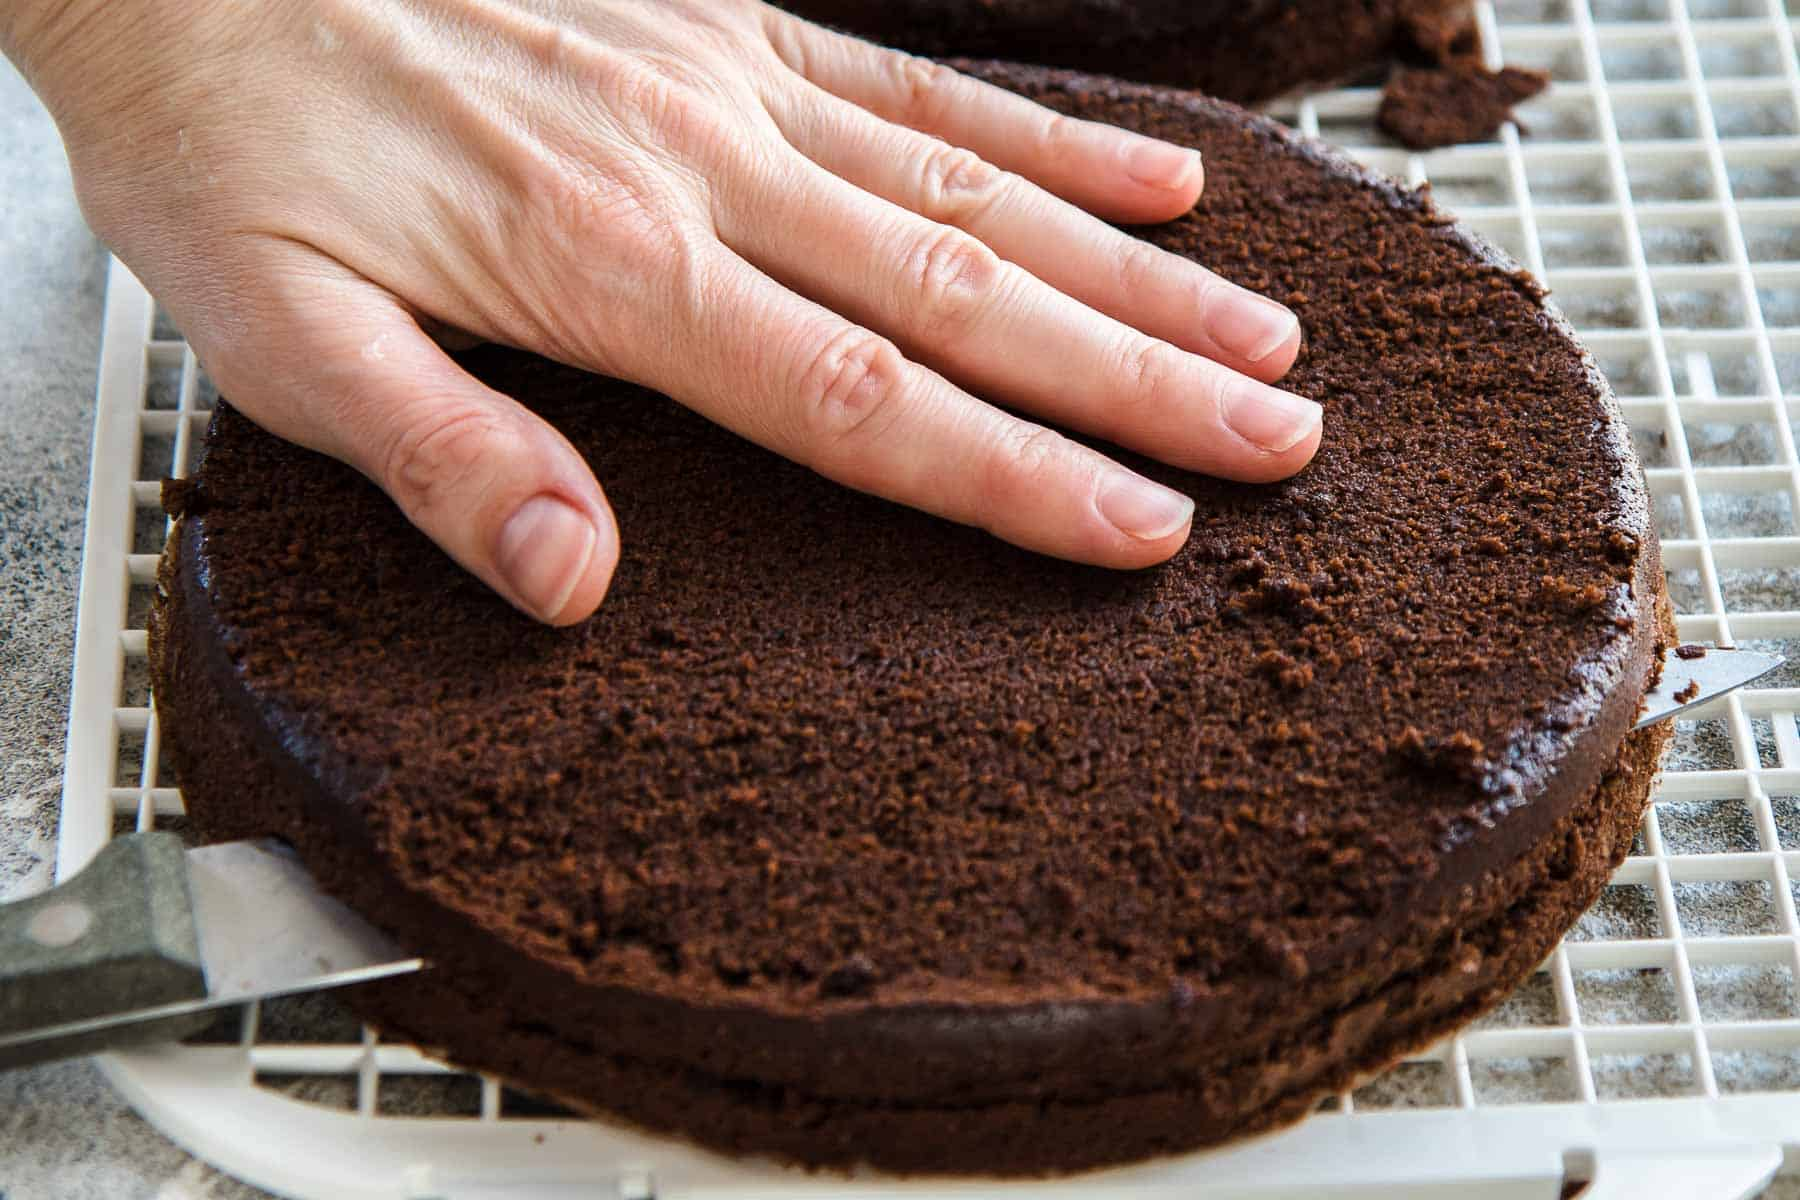 Cutting the chocolate cake layers in half horizontally